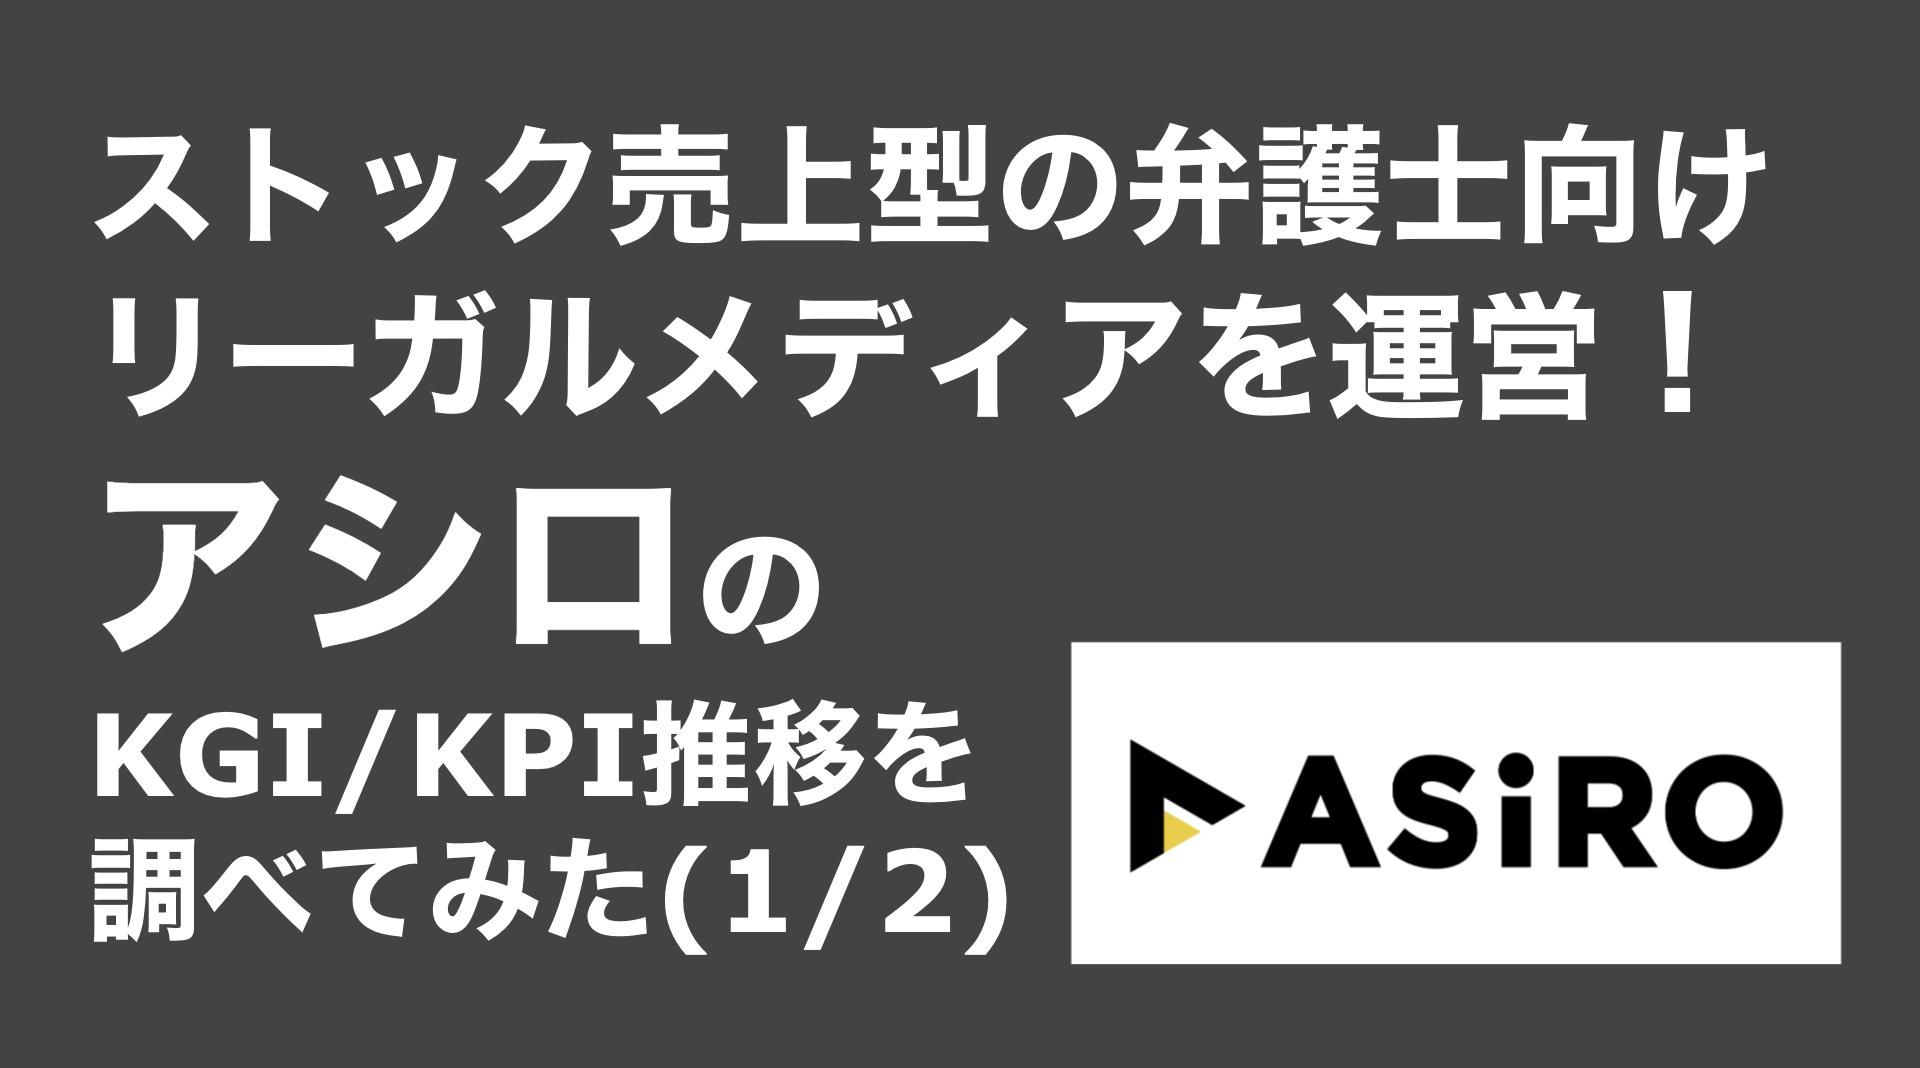 saaslife_ストック売上型の弁護士向けリーガルメディアを運営!アシロのKGI/KPI推移を調べてみた(1/2)